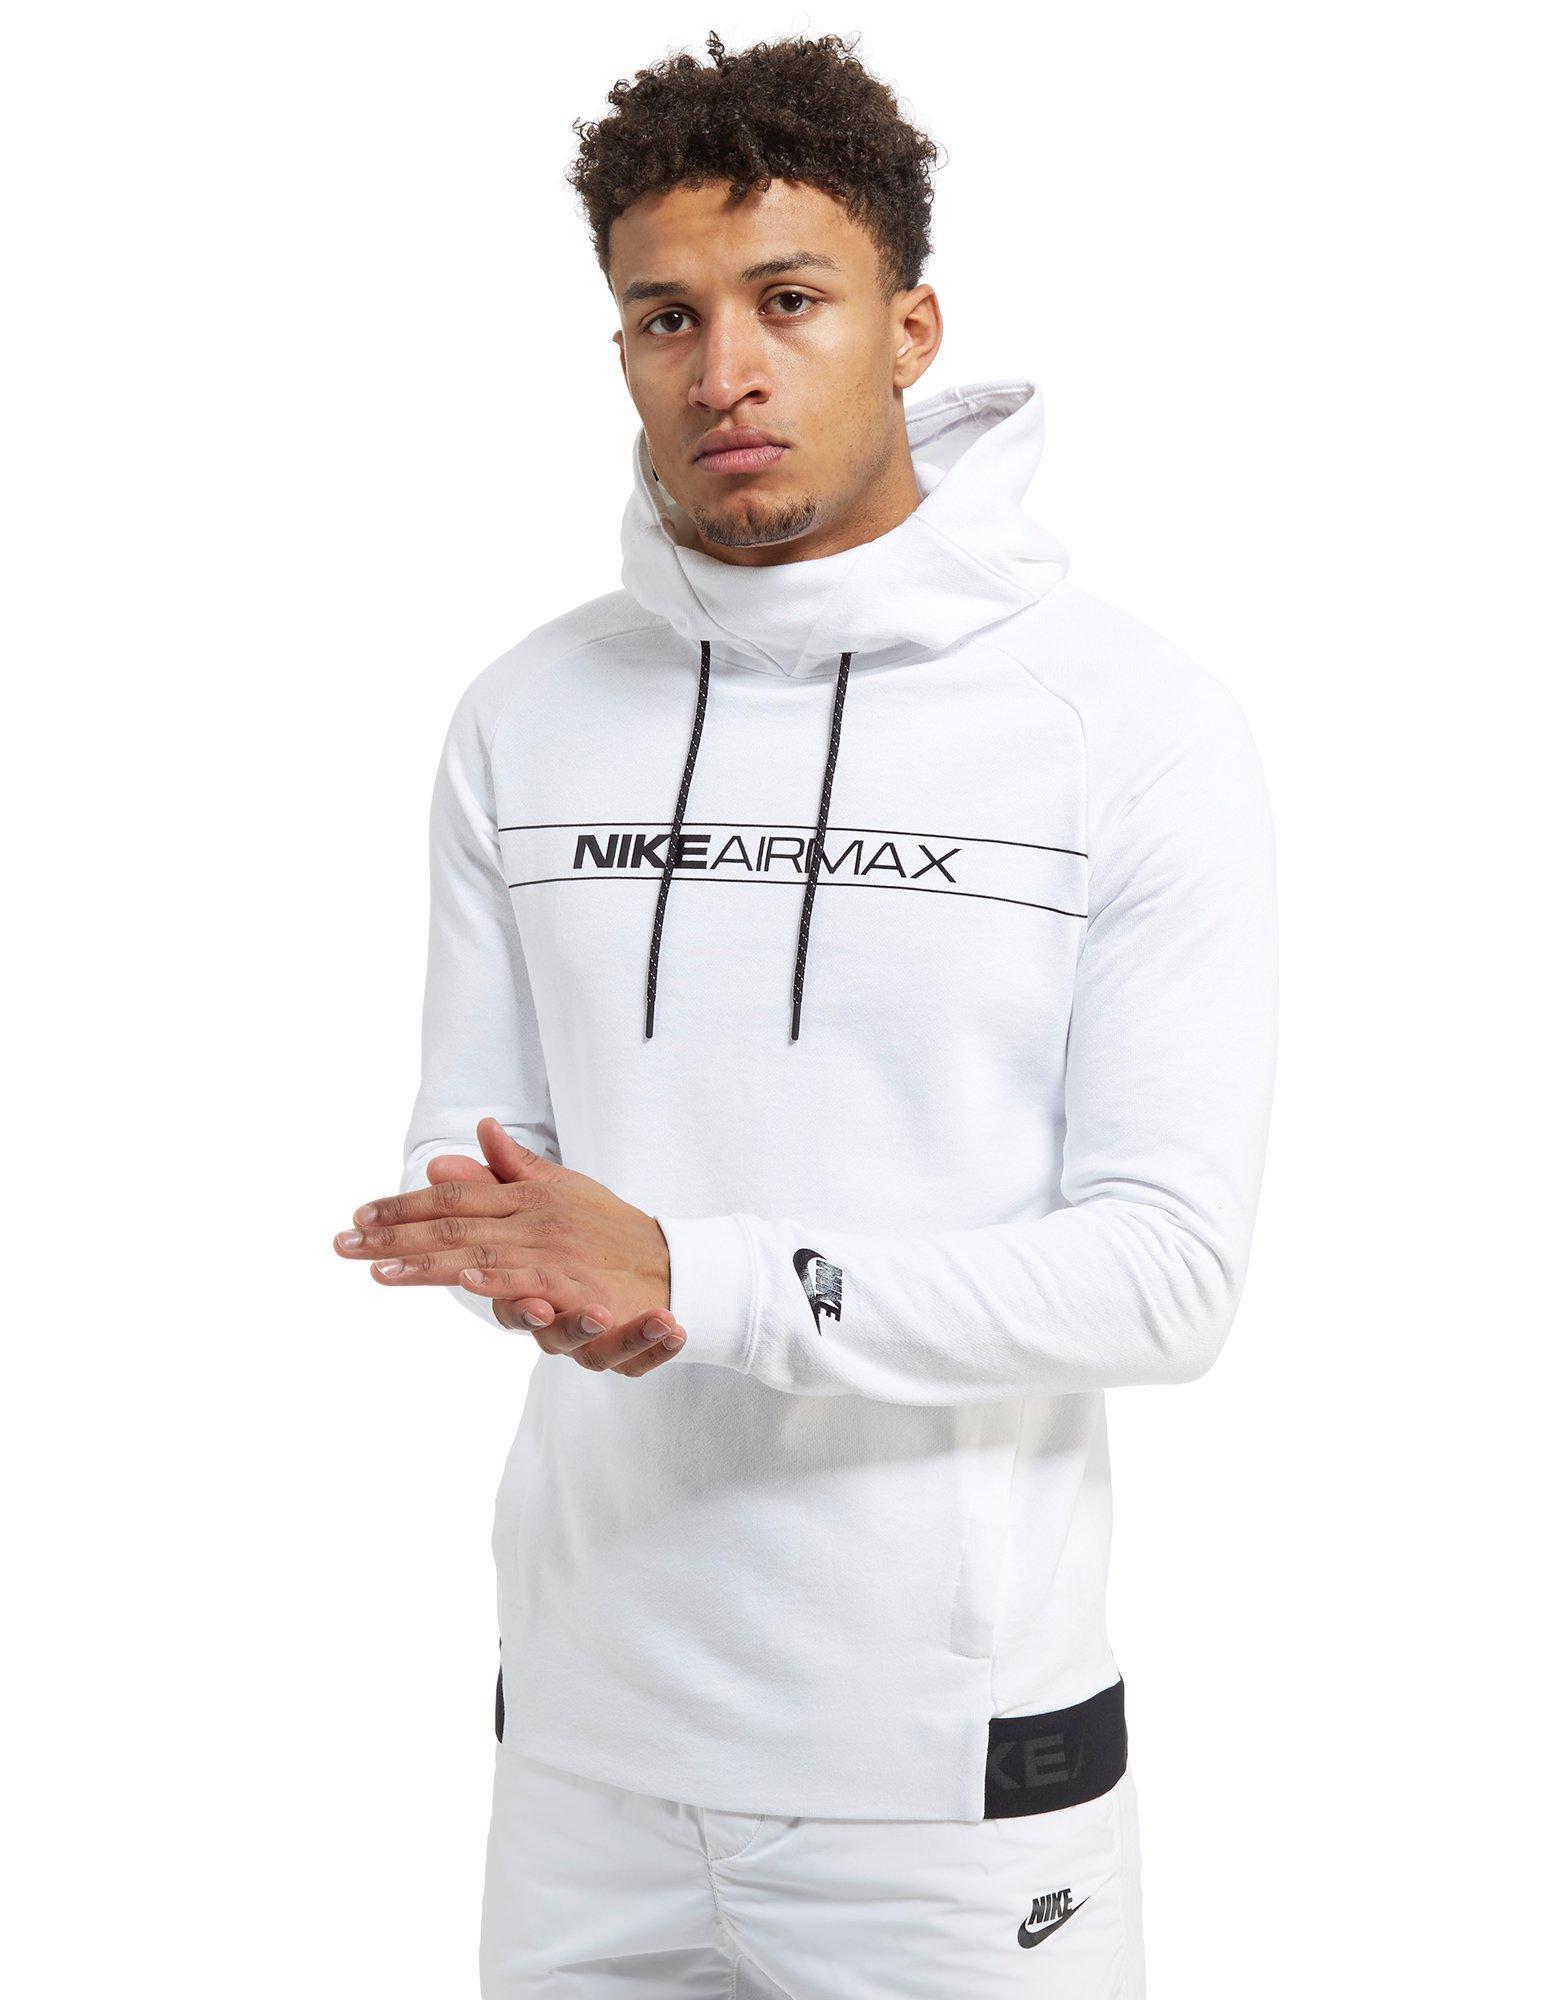 97bdee446d16 Nike Air Max Overhead Hoodie in White for Men - Lyst